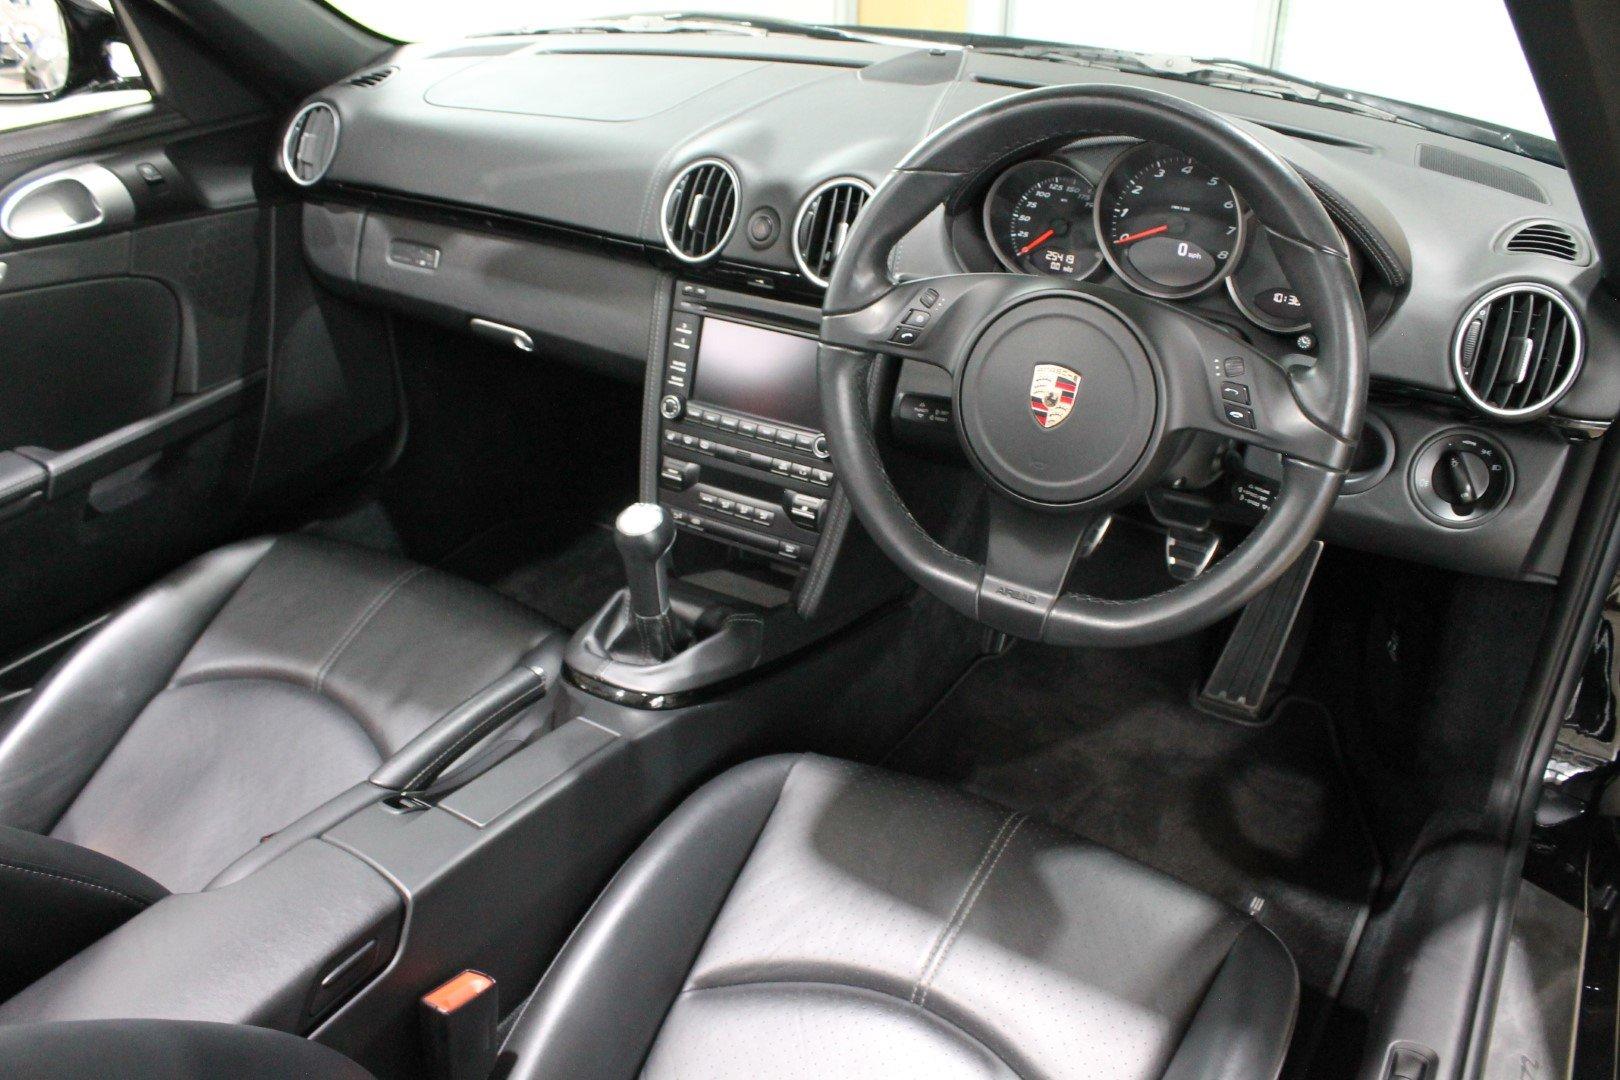 2011 Porsche Boxster (987) 3.4 S Black Edition Manual For Sale (picture 11 of 12)